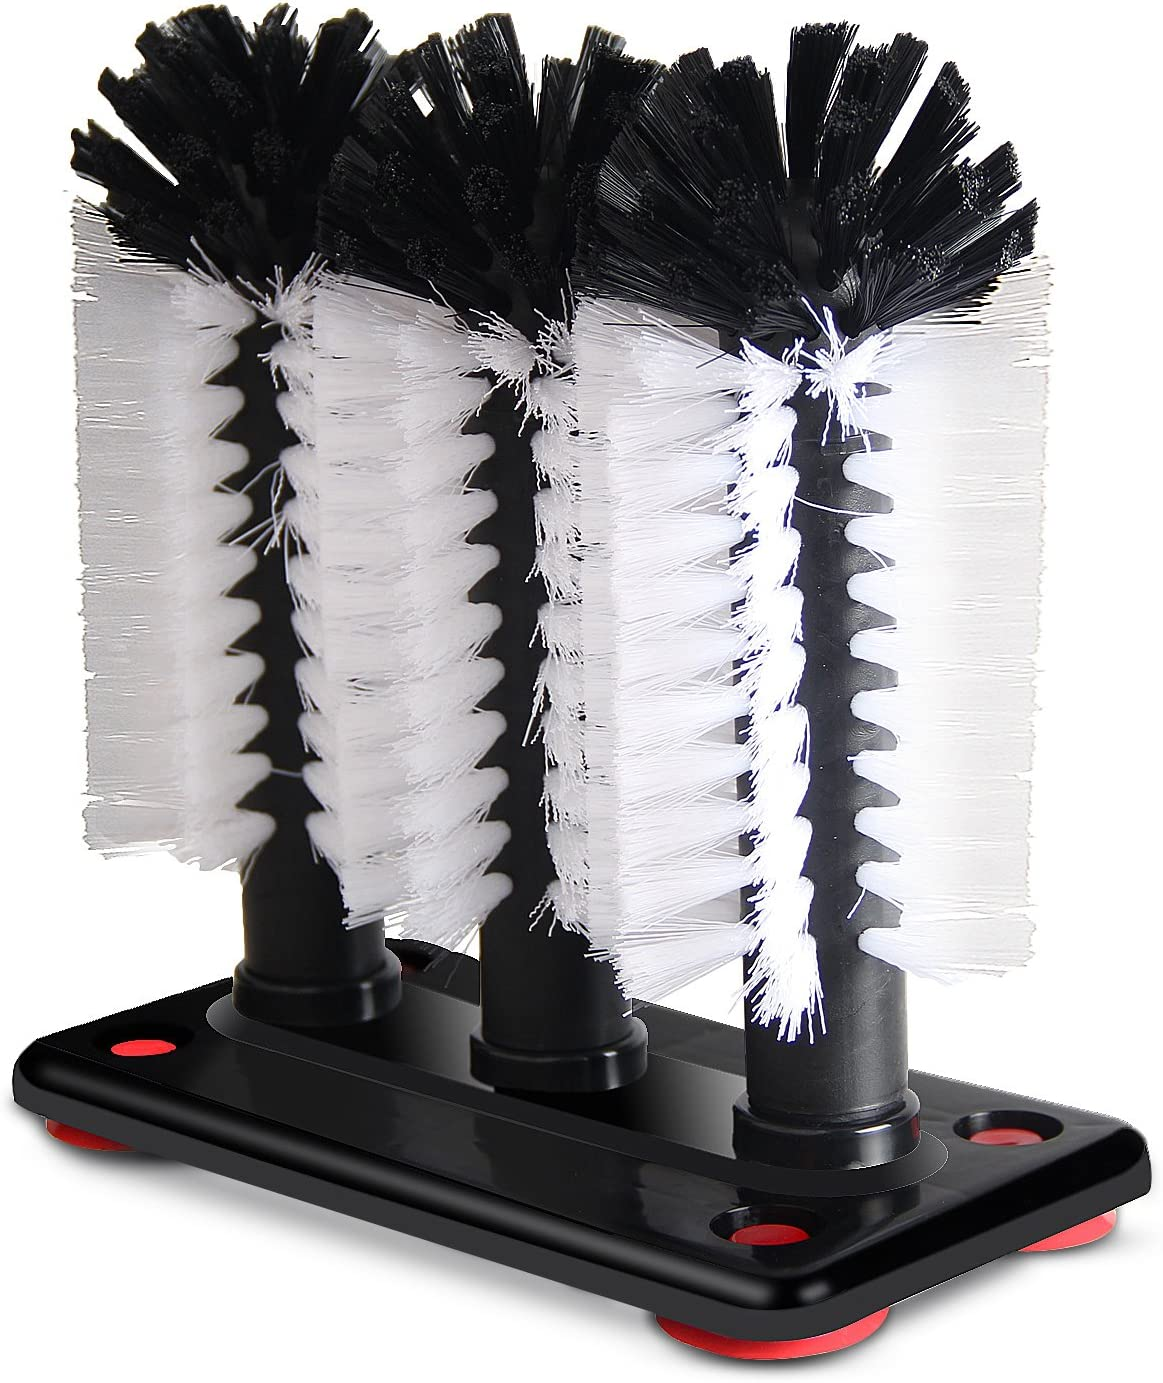 Glass New Orleans Mall Washer Brush Austin Mall Cleaner - Base Brushes per 3